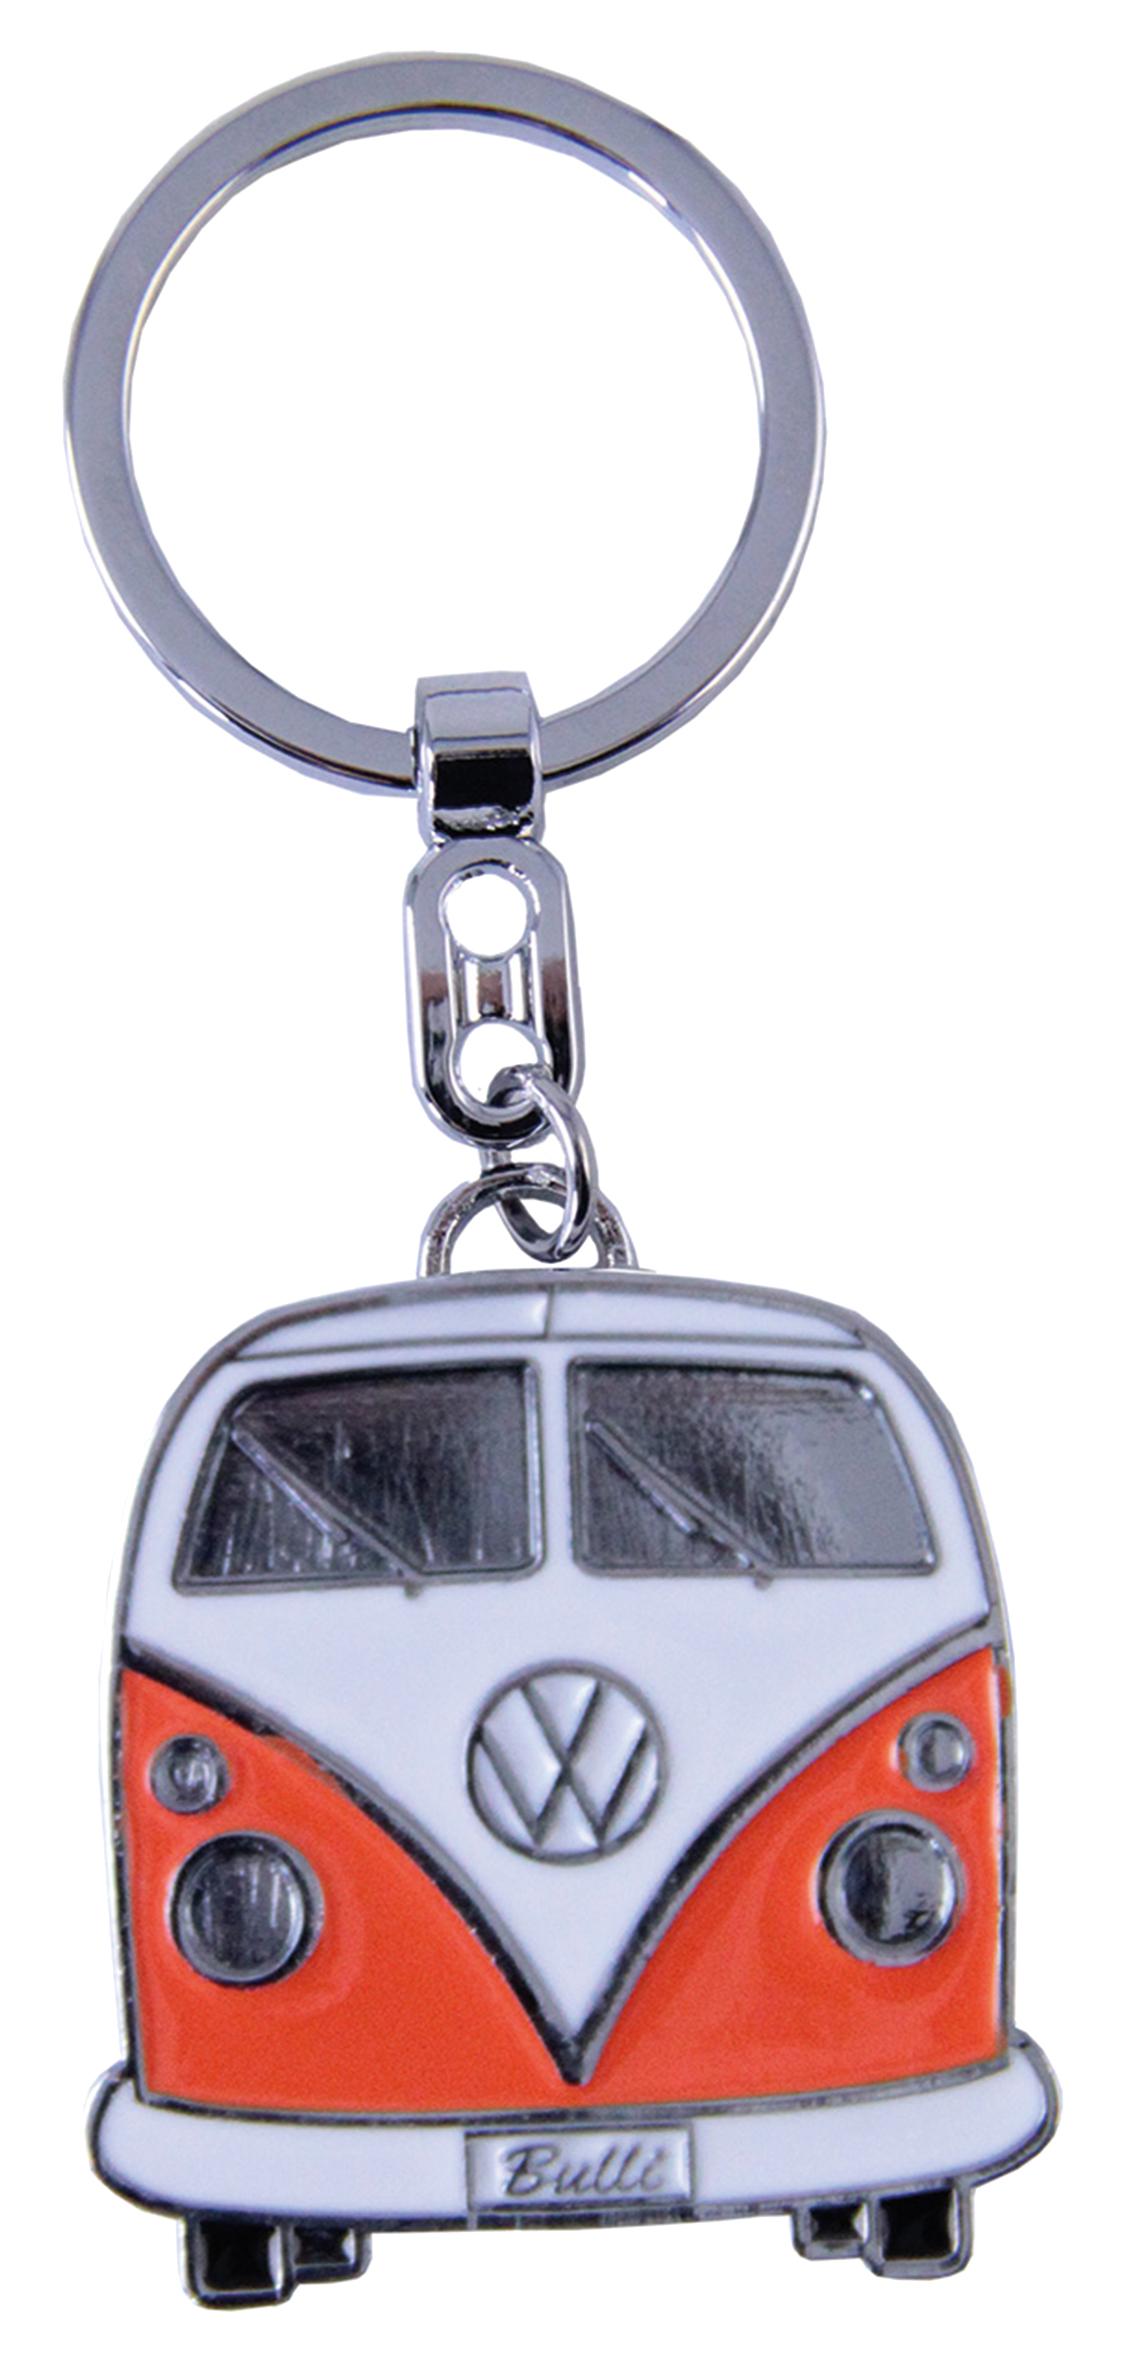 VW Collection Schlüsselanhänger rot